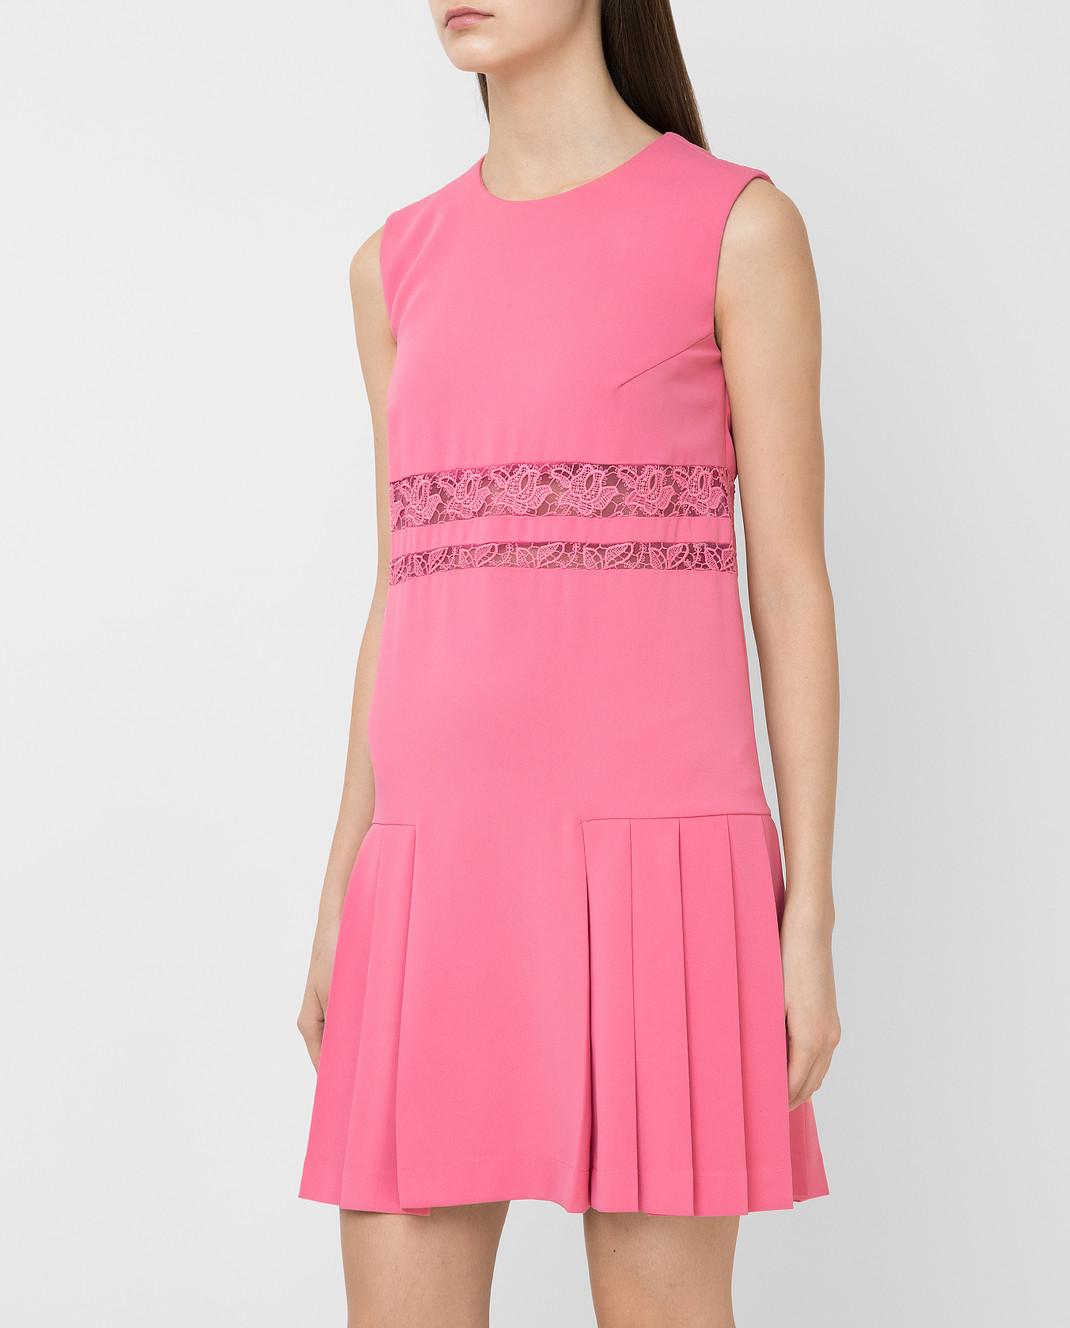 Ermanno Scervino Розовое платье изображение 3